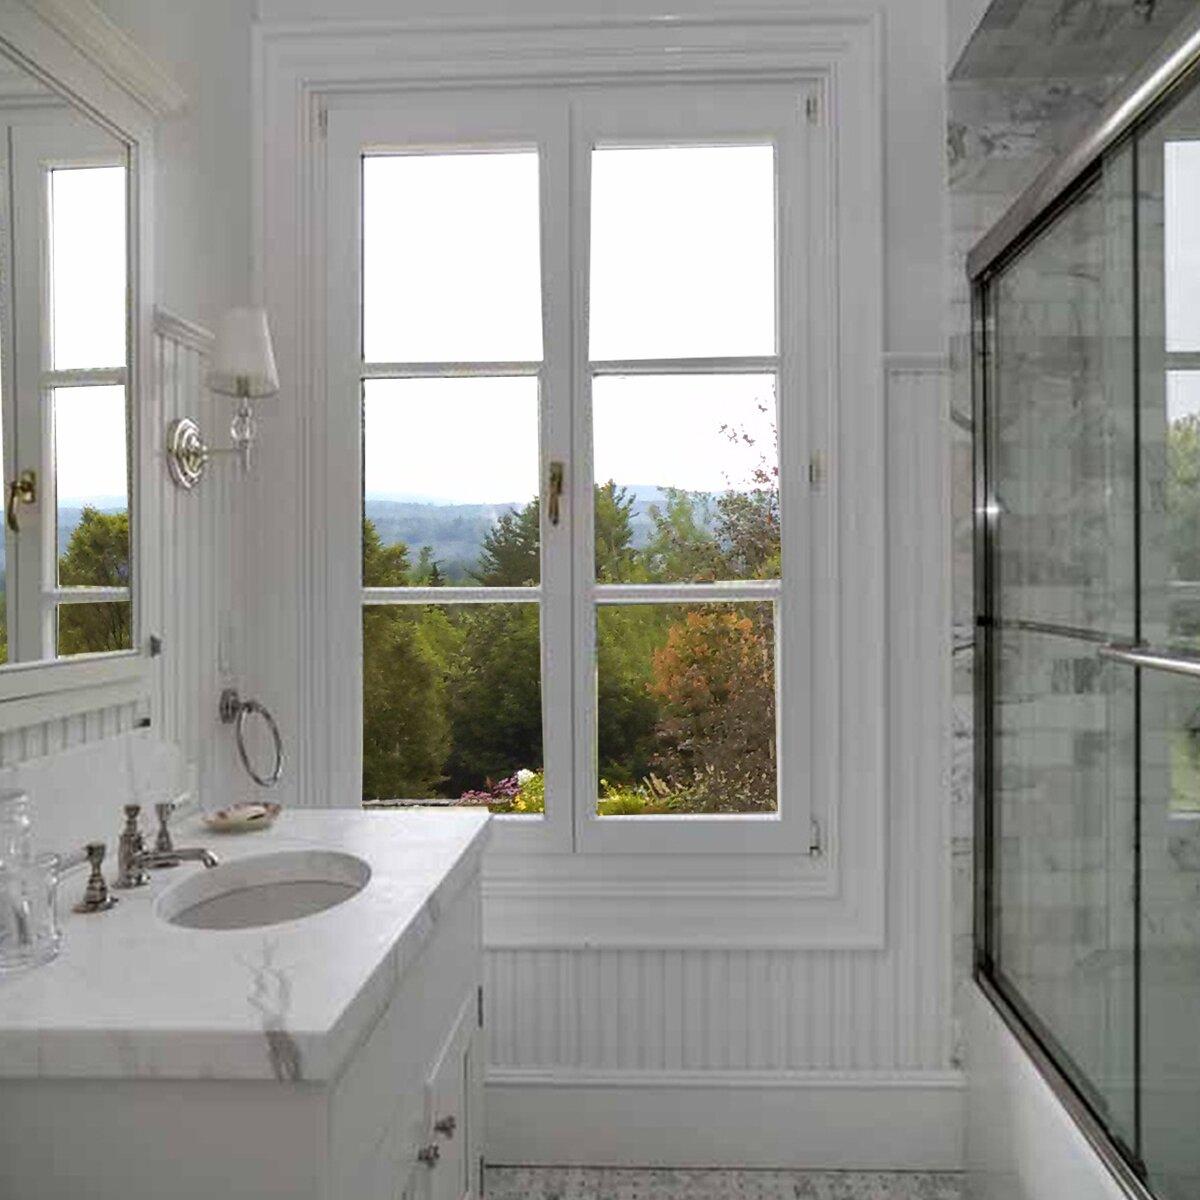 Nantucket Sinks Oval Undercounter Bathroom Sink With Nantucket Sinks Great  Point Oval Undercounter Bathroom Sink Reviews